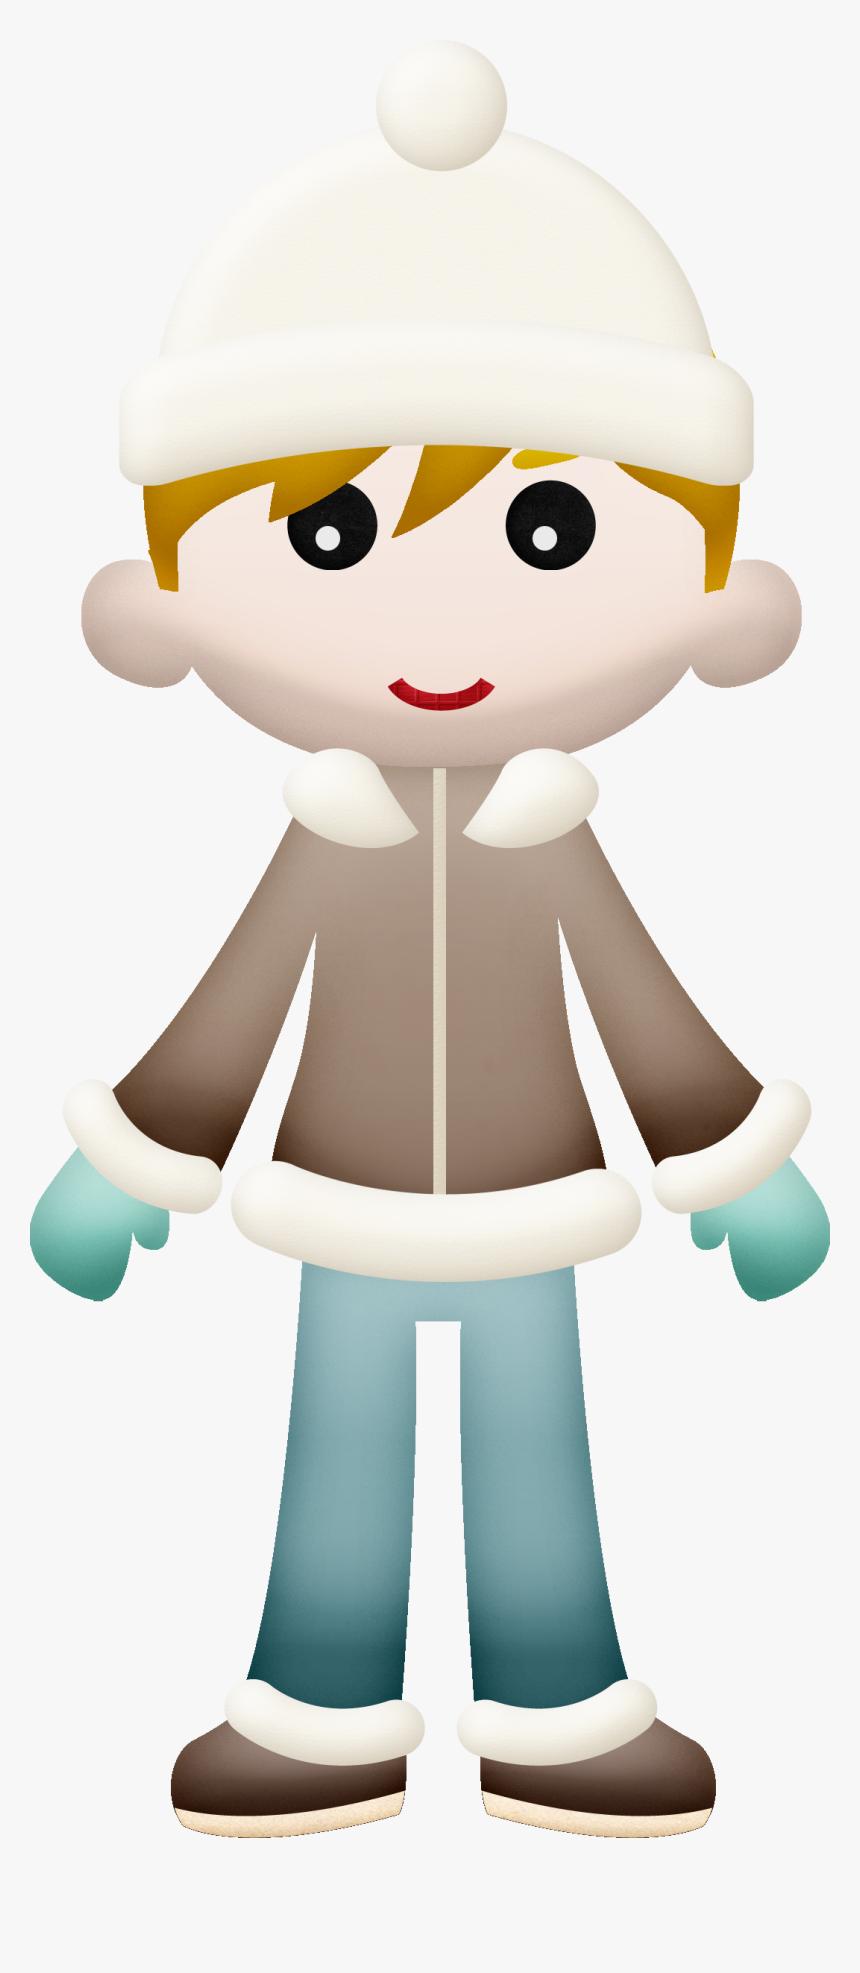 Winter Little Boy Clip Art - Clip Art, HD Png Download, Free Download